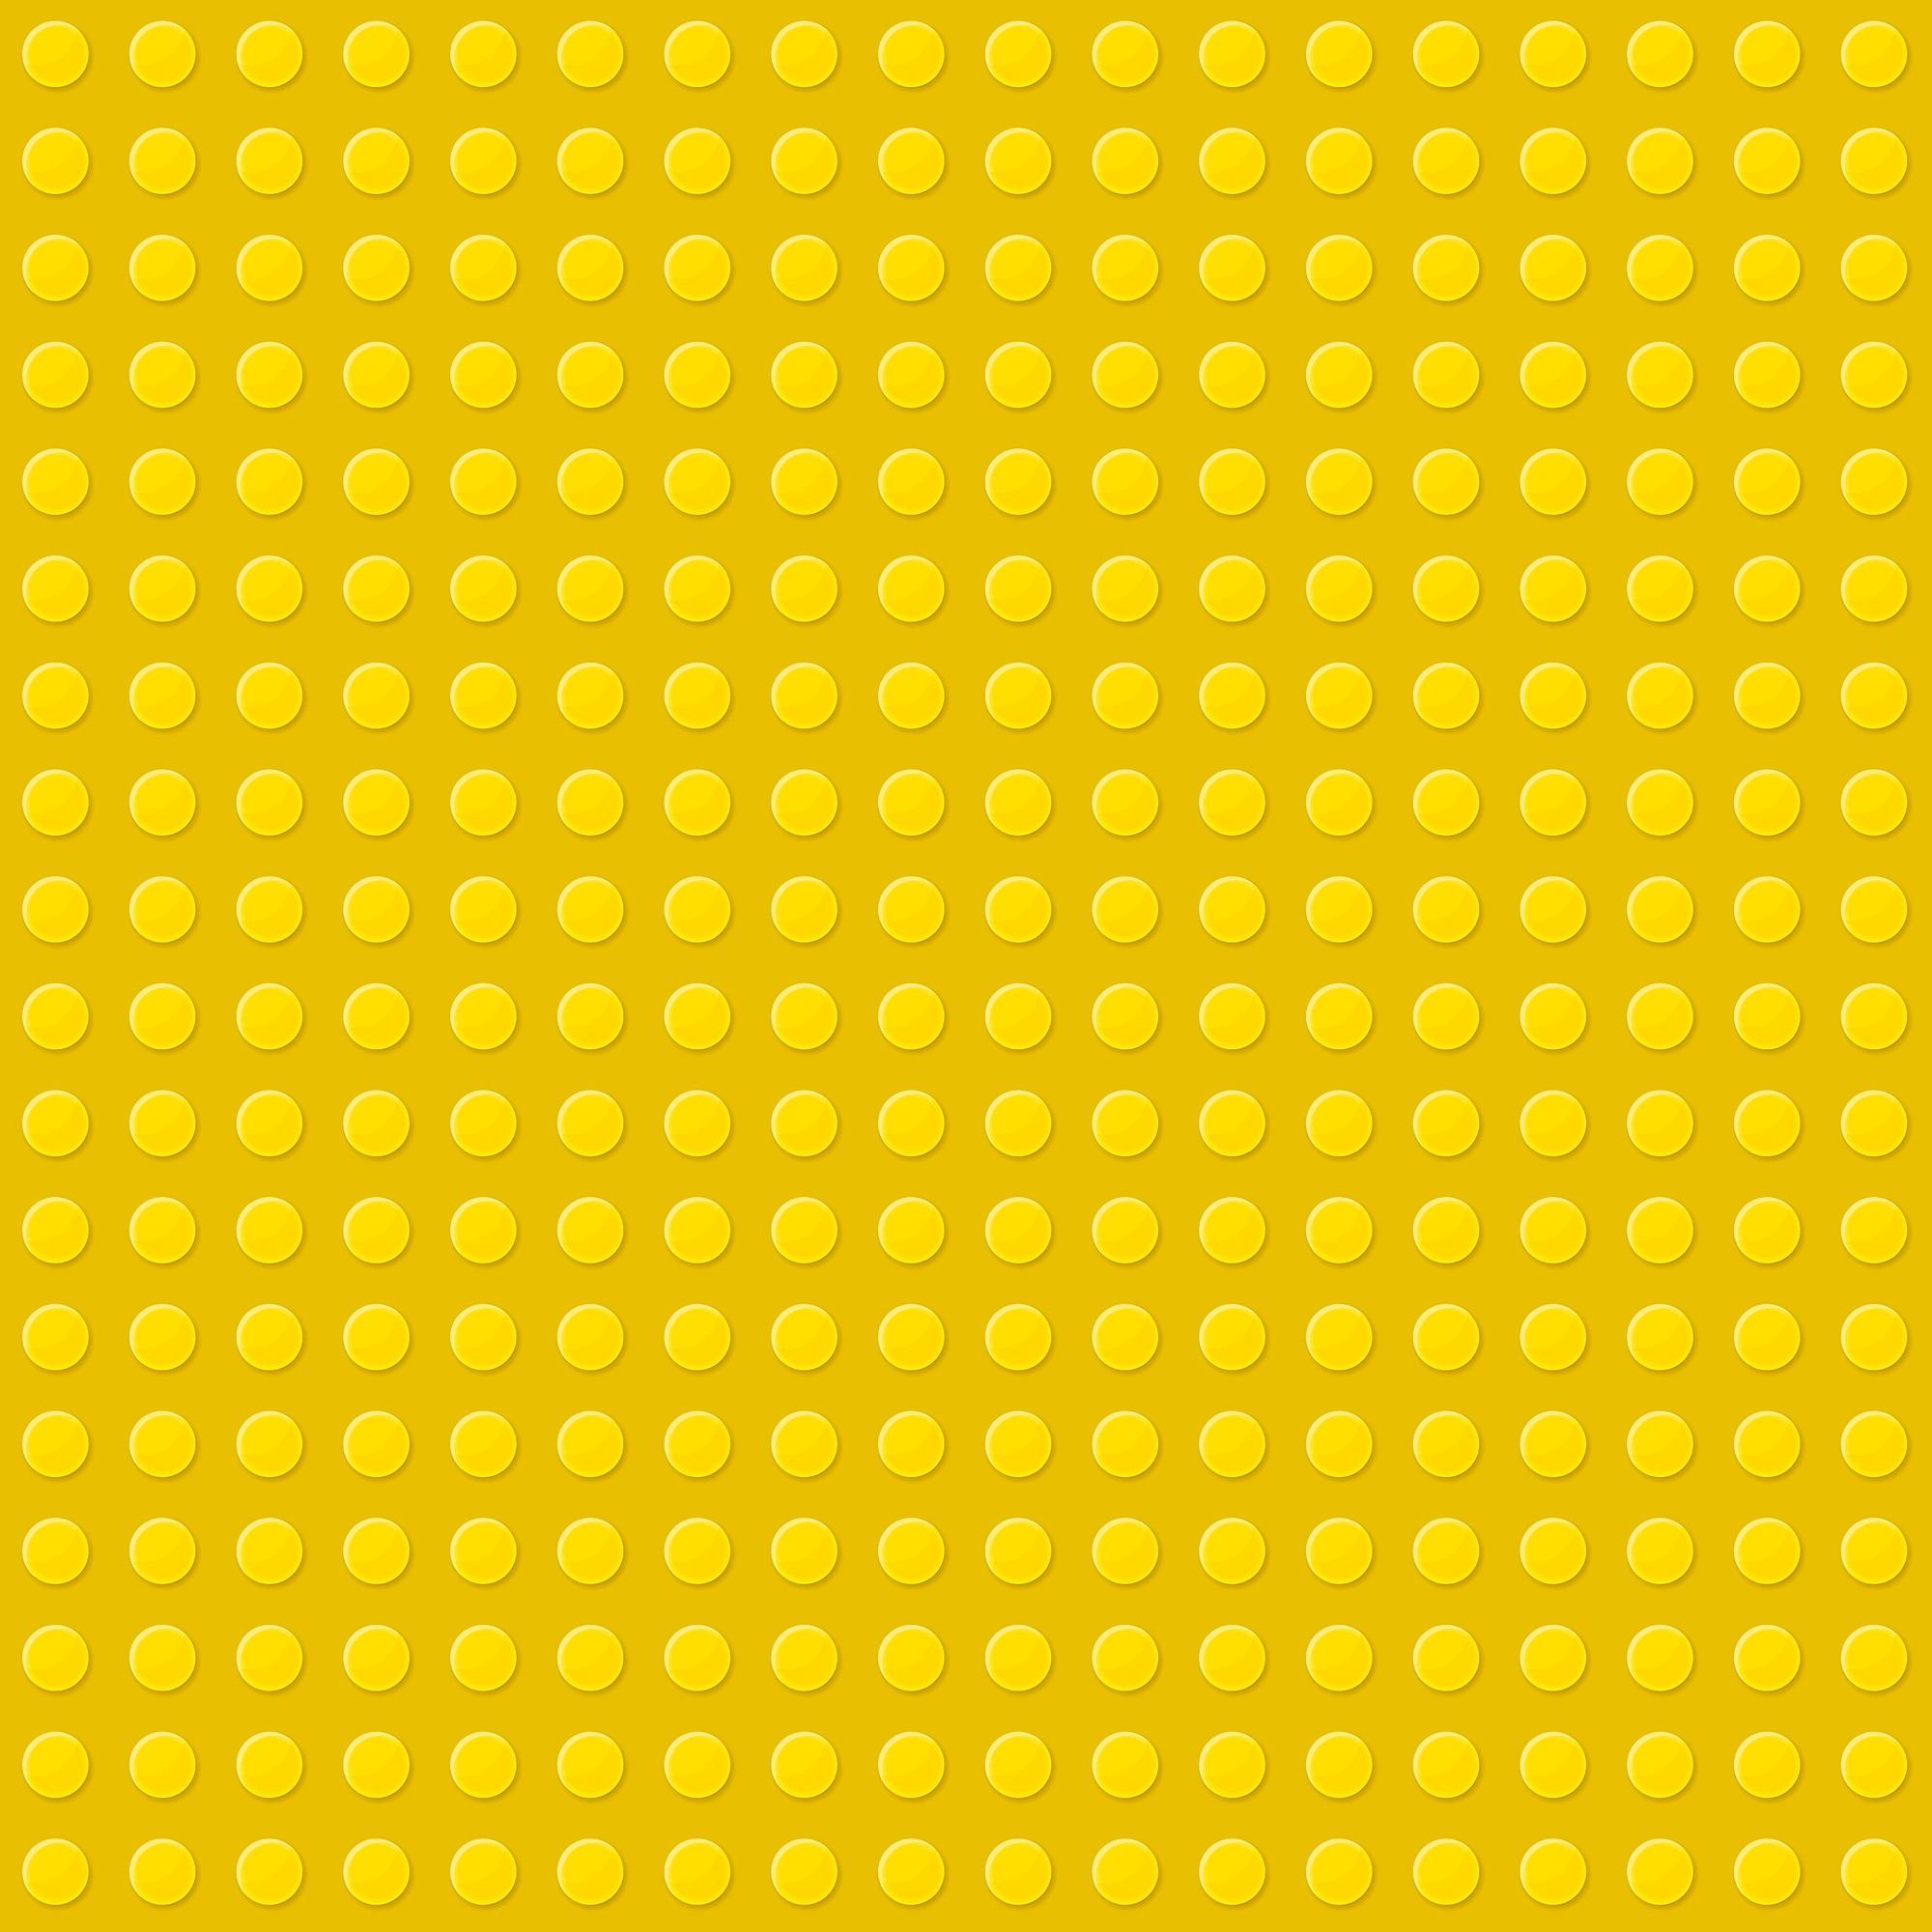 lego brick wallpaper wwwpixsharkcom images galleries